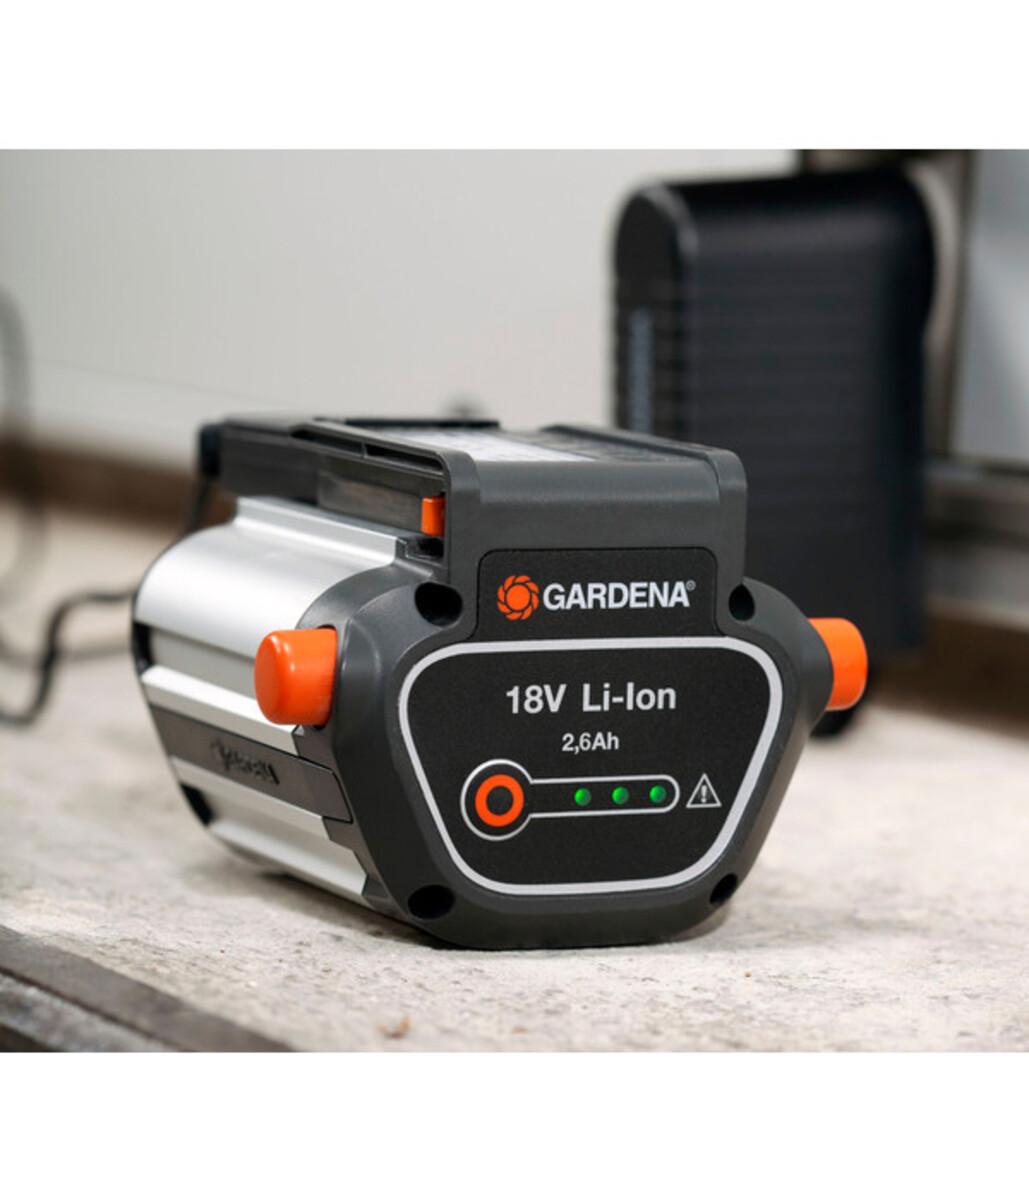 Bild 2 von GARDENA System Akku BLi-18